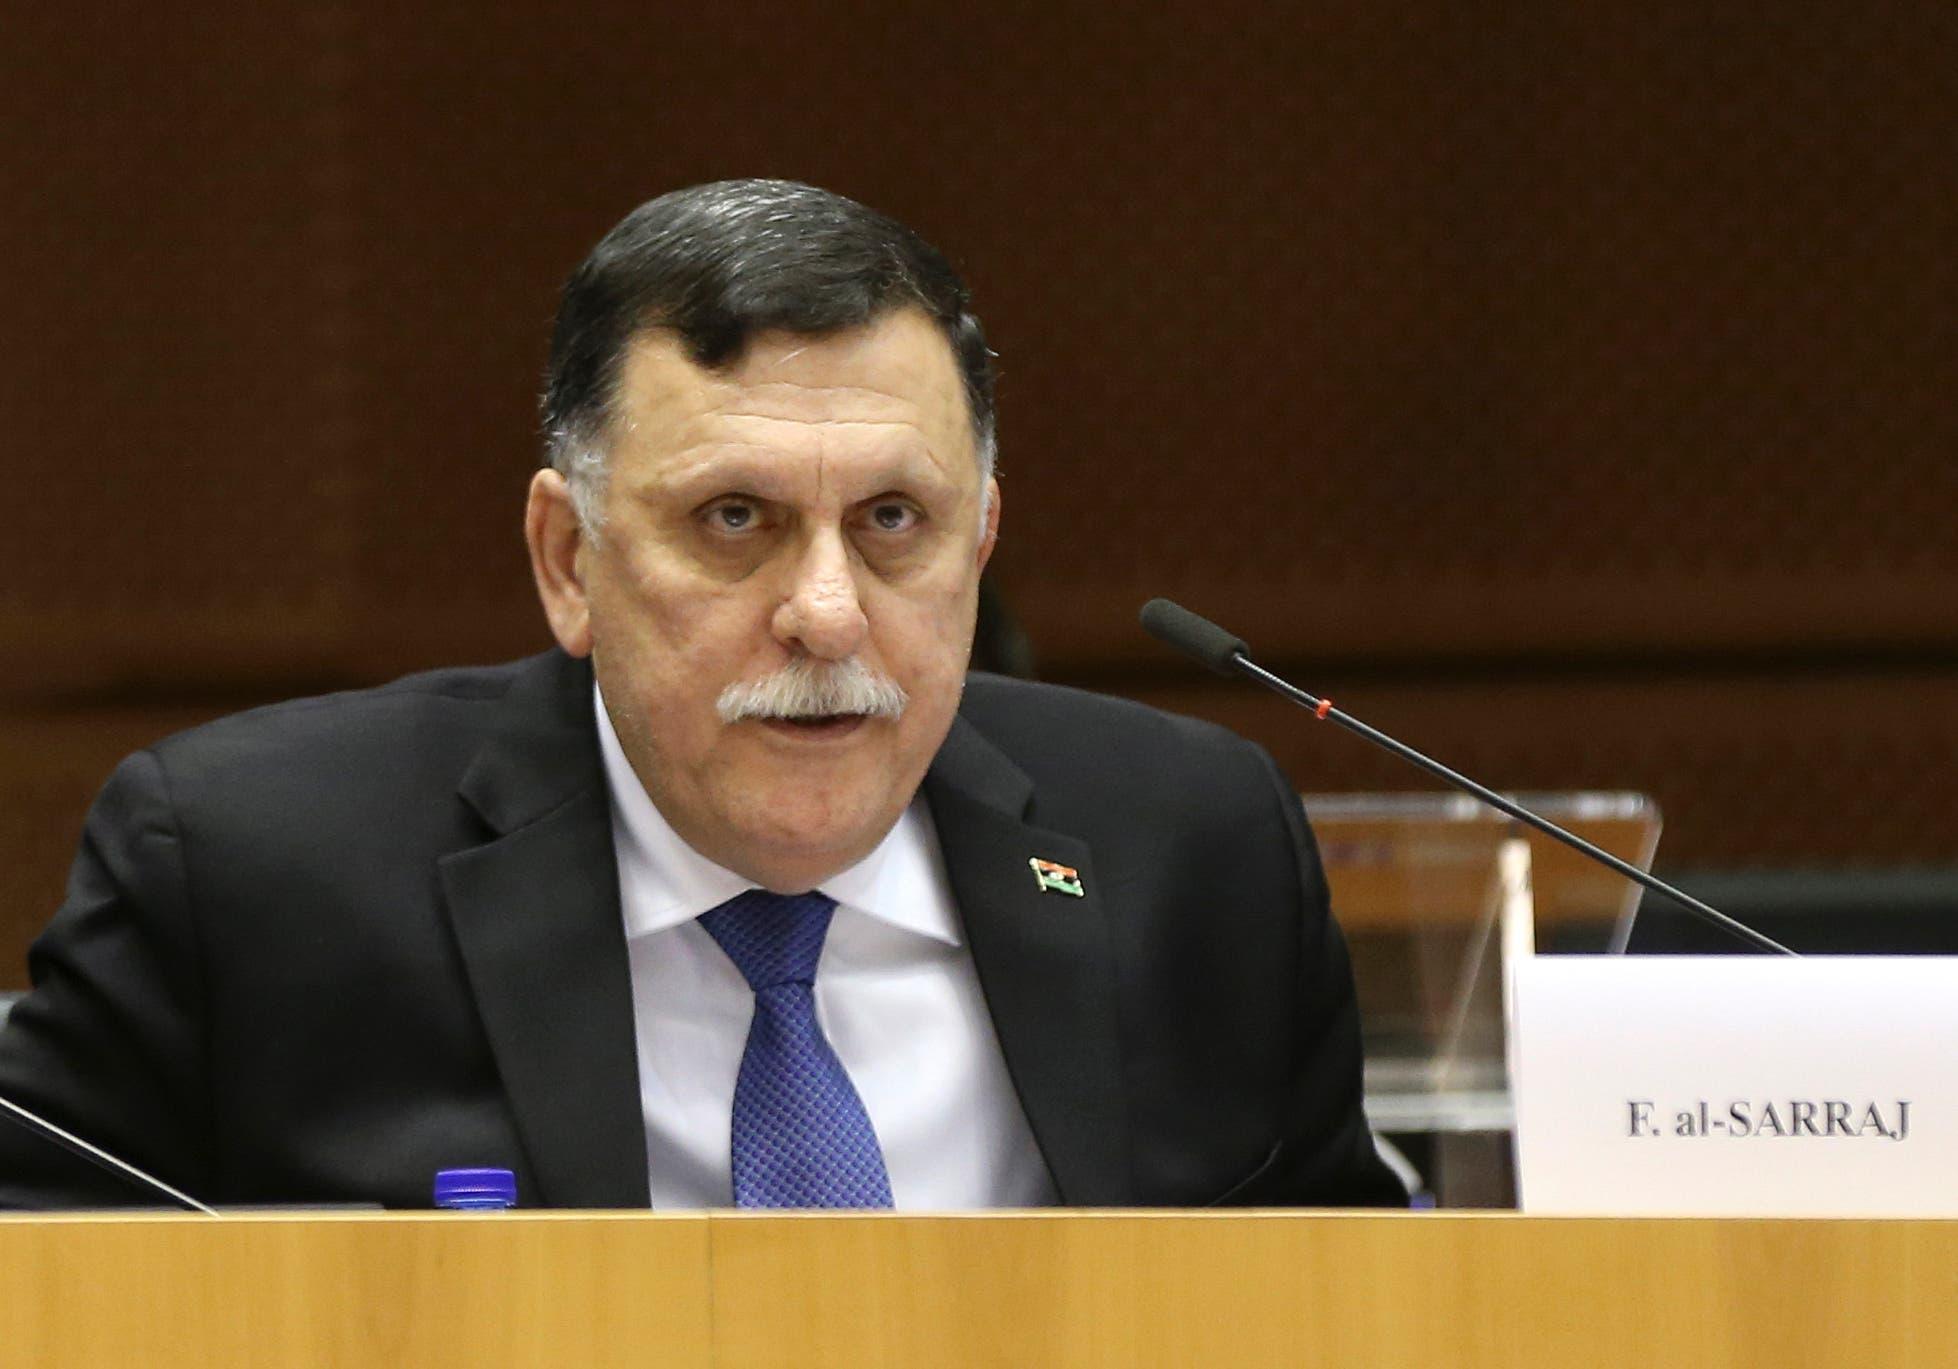 Fayez al-Sarraj addresses a news conference at the EU Commission headquarters in Brussels, Belgium February 2, 2017. (Reuters)